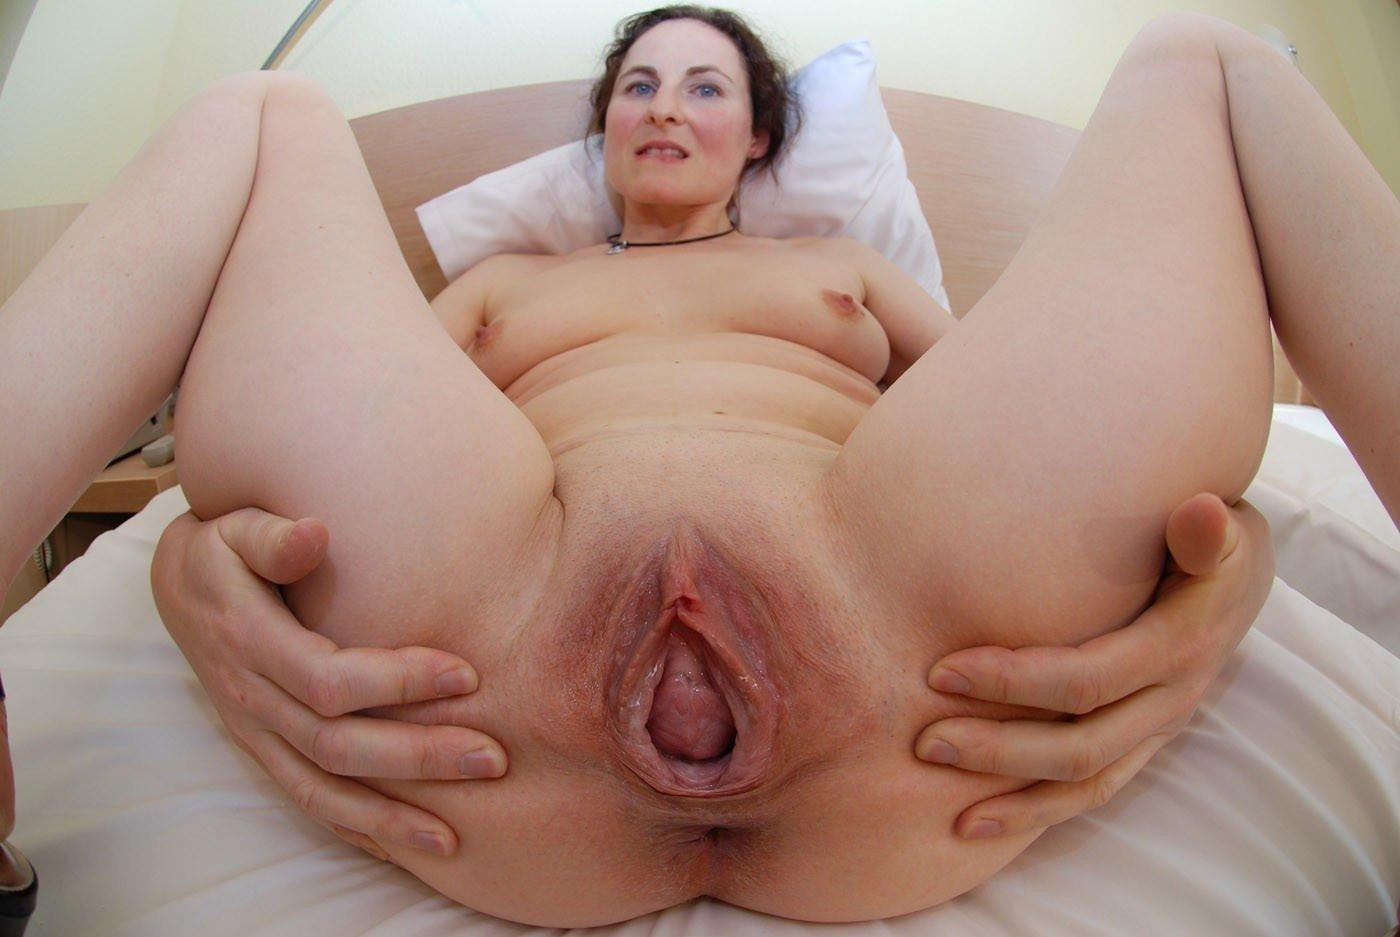 Ssbbw Pregnant Women Open Pussy Fuk Hq Porn Pics